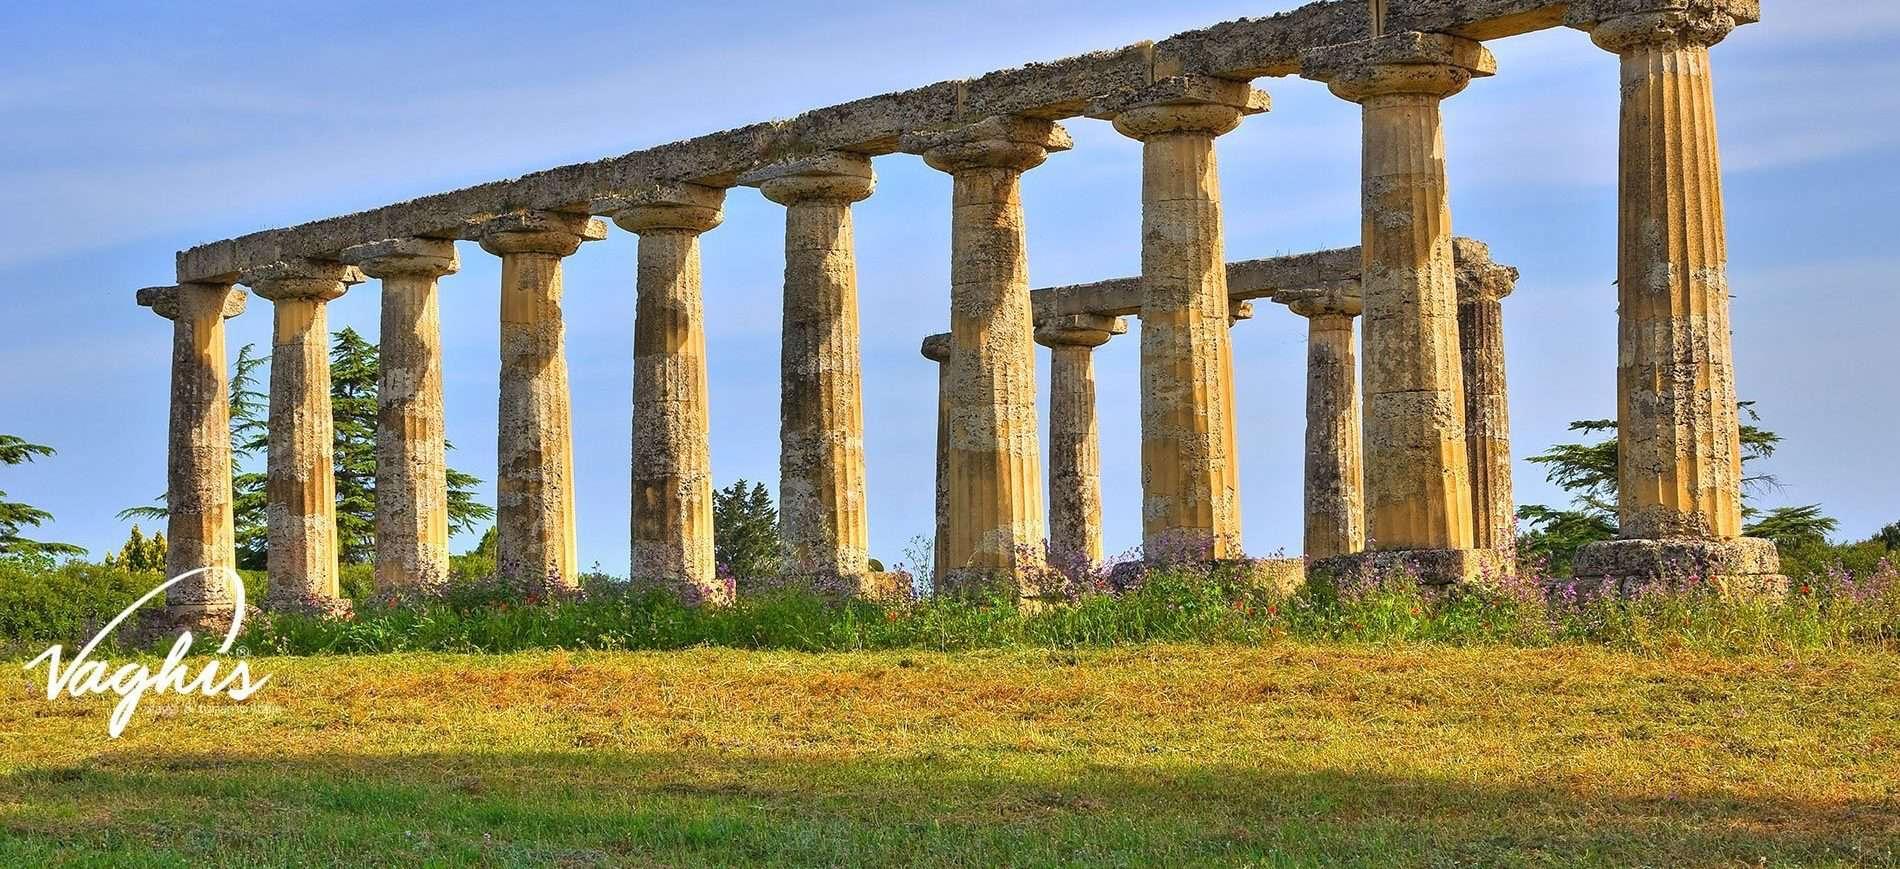 Metaponto - Tavole palatine - © Vaghis - viaggi & turismo Italia Tutti i diritti riservati